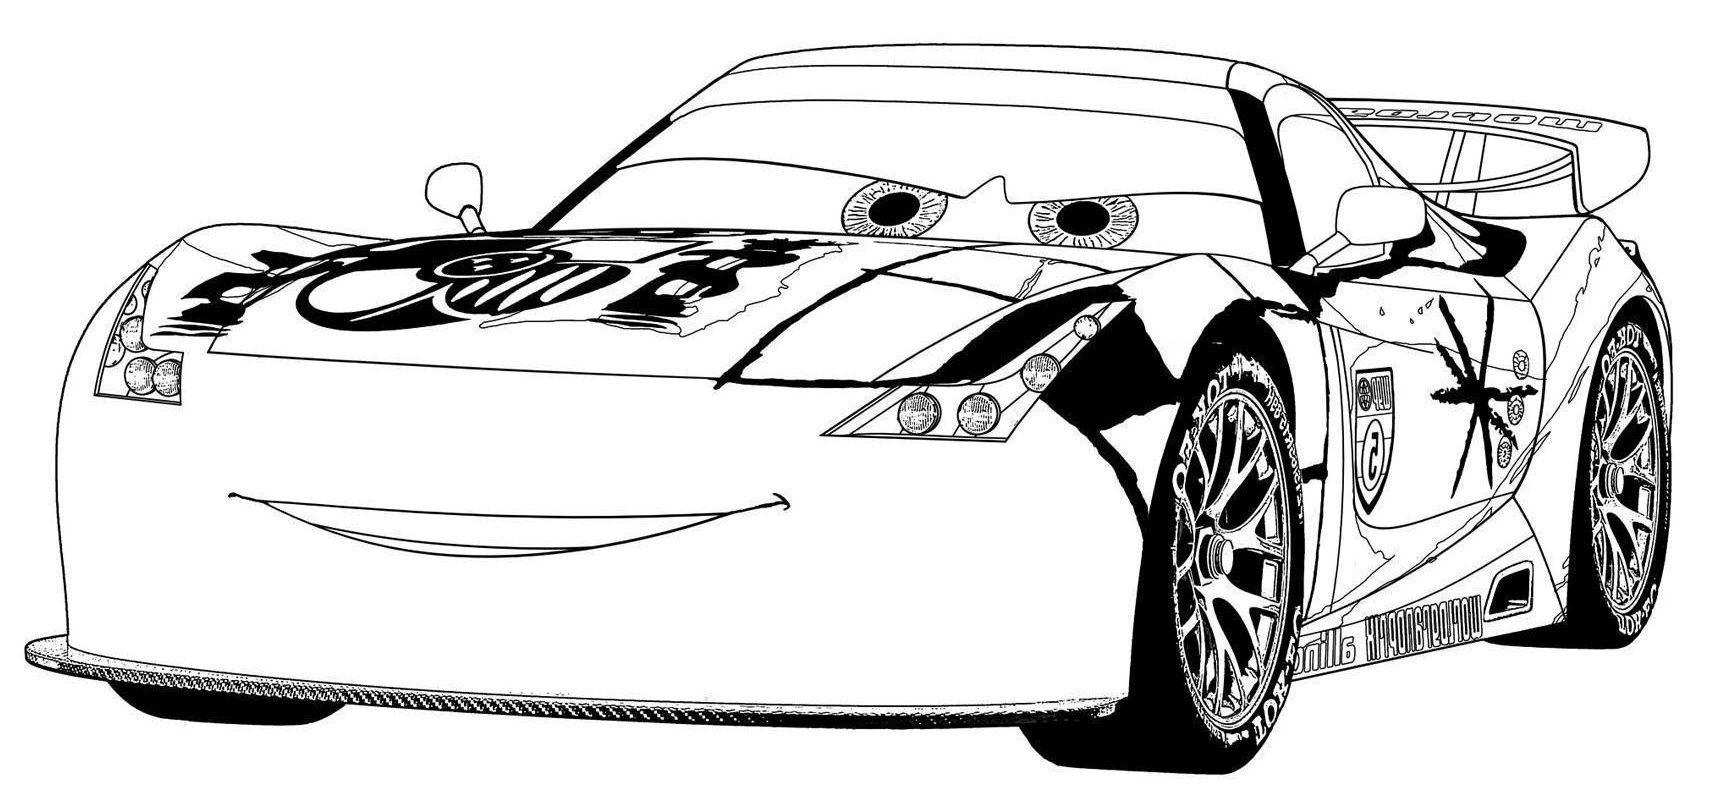 Rennauto Disney Cars Lightning Mcqueen E1529873911295 Rennen Ausmalen Disney Cars